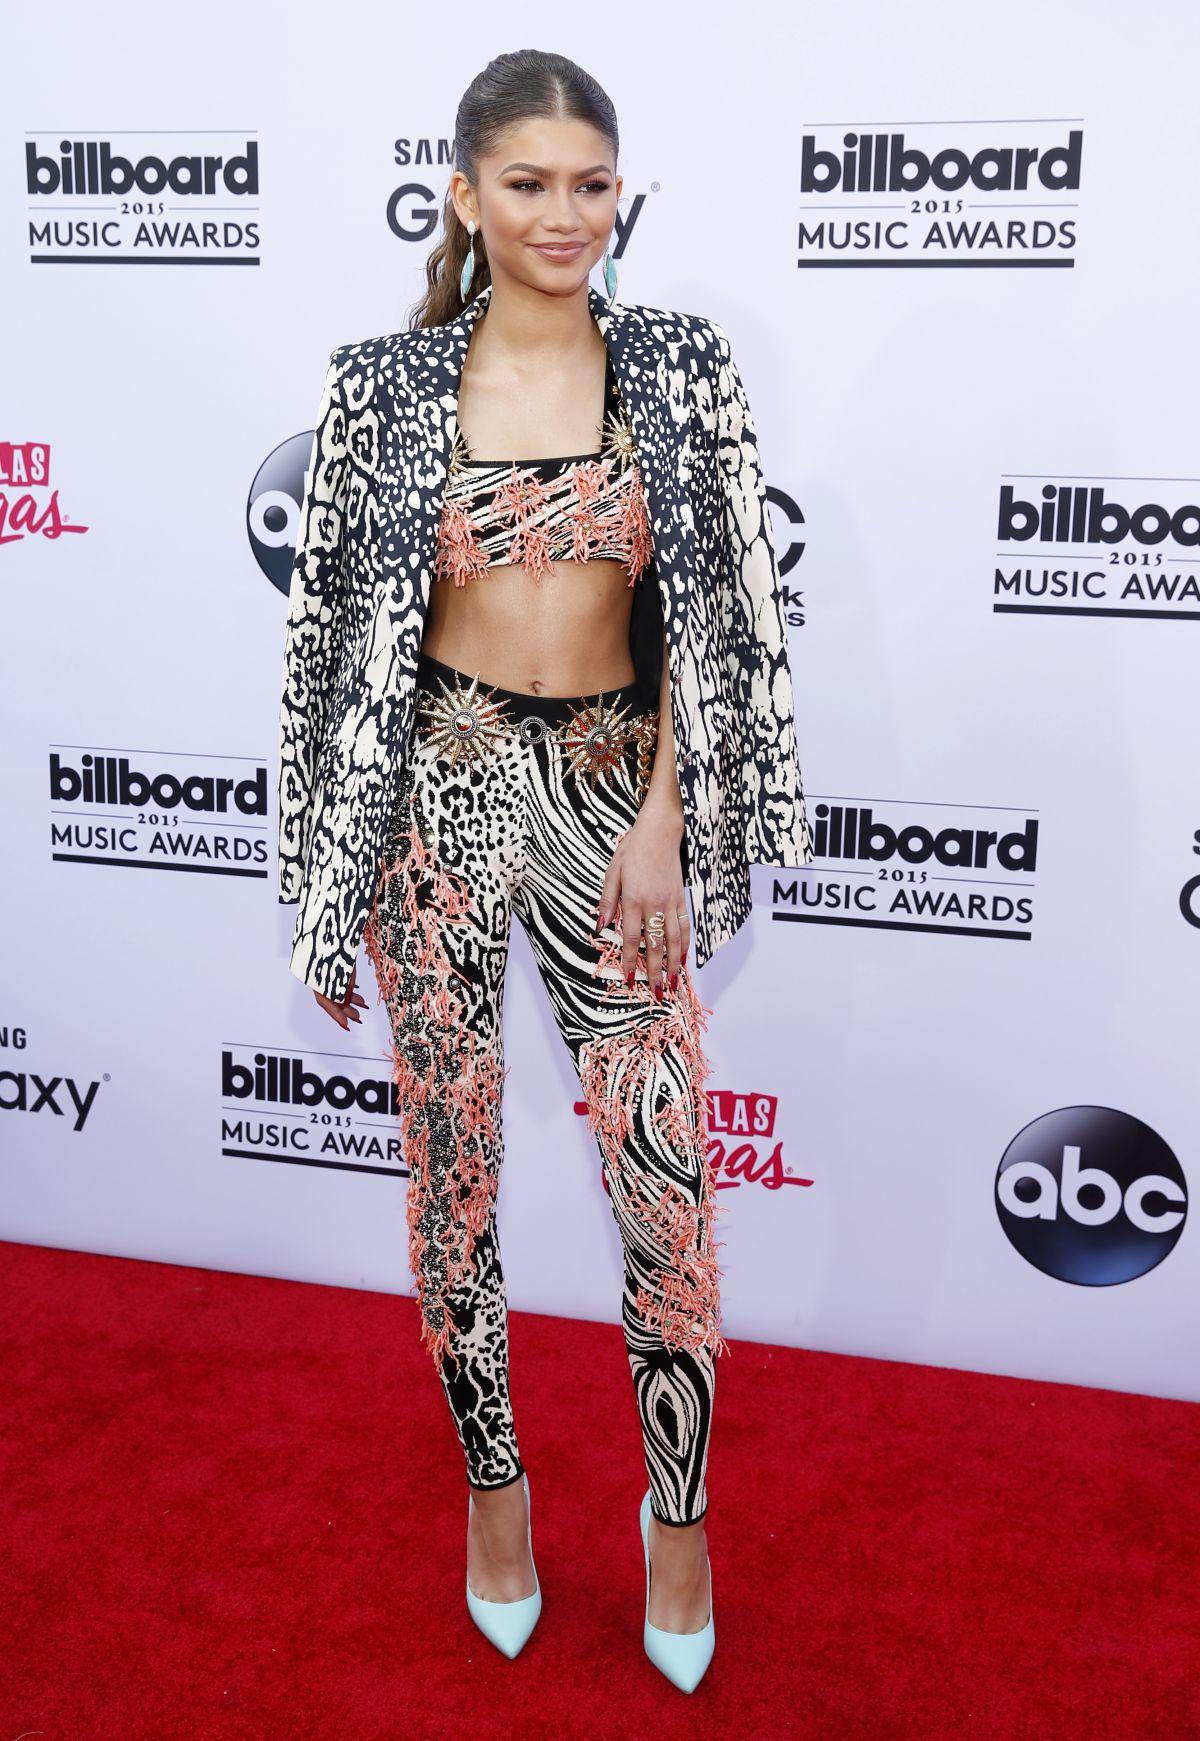 Billboard Music Awards 2016 The Best Hair And Makeup: ZENDAYA COLEMAN At 2015 Billboard Music Awards In Las